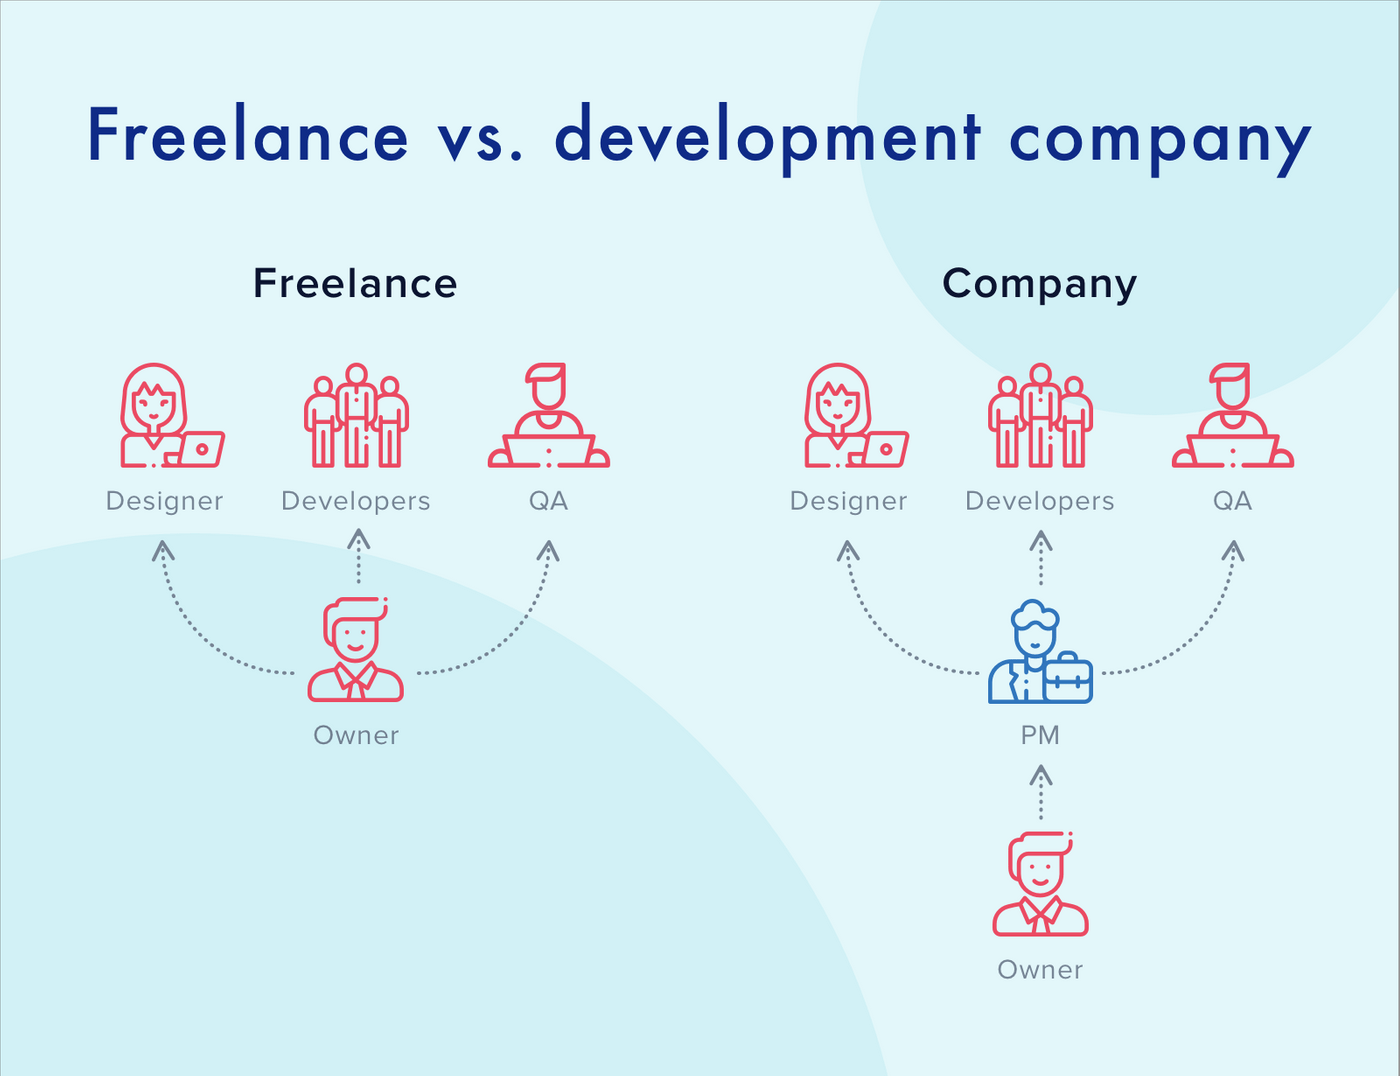 Freelance vs. development company outsourcing